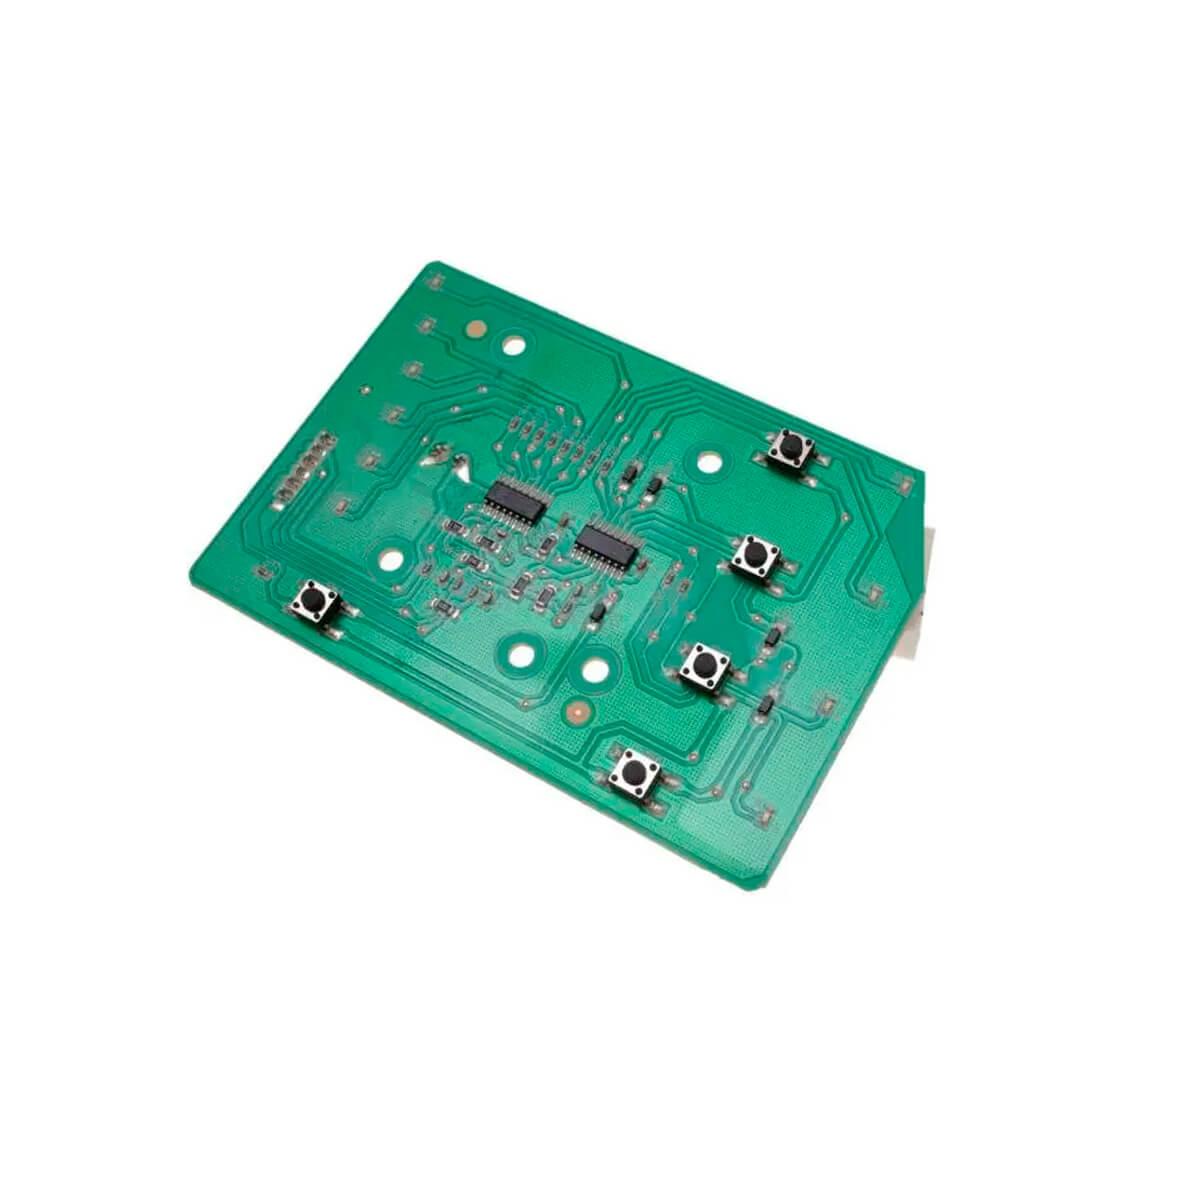 Placa De Interface Para Lavadora Top Load Electrolux LAC16 - A99035301